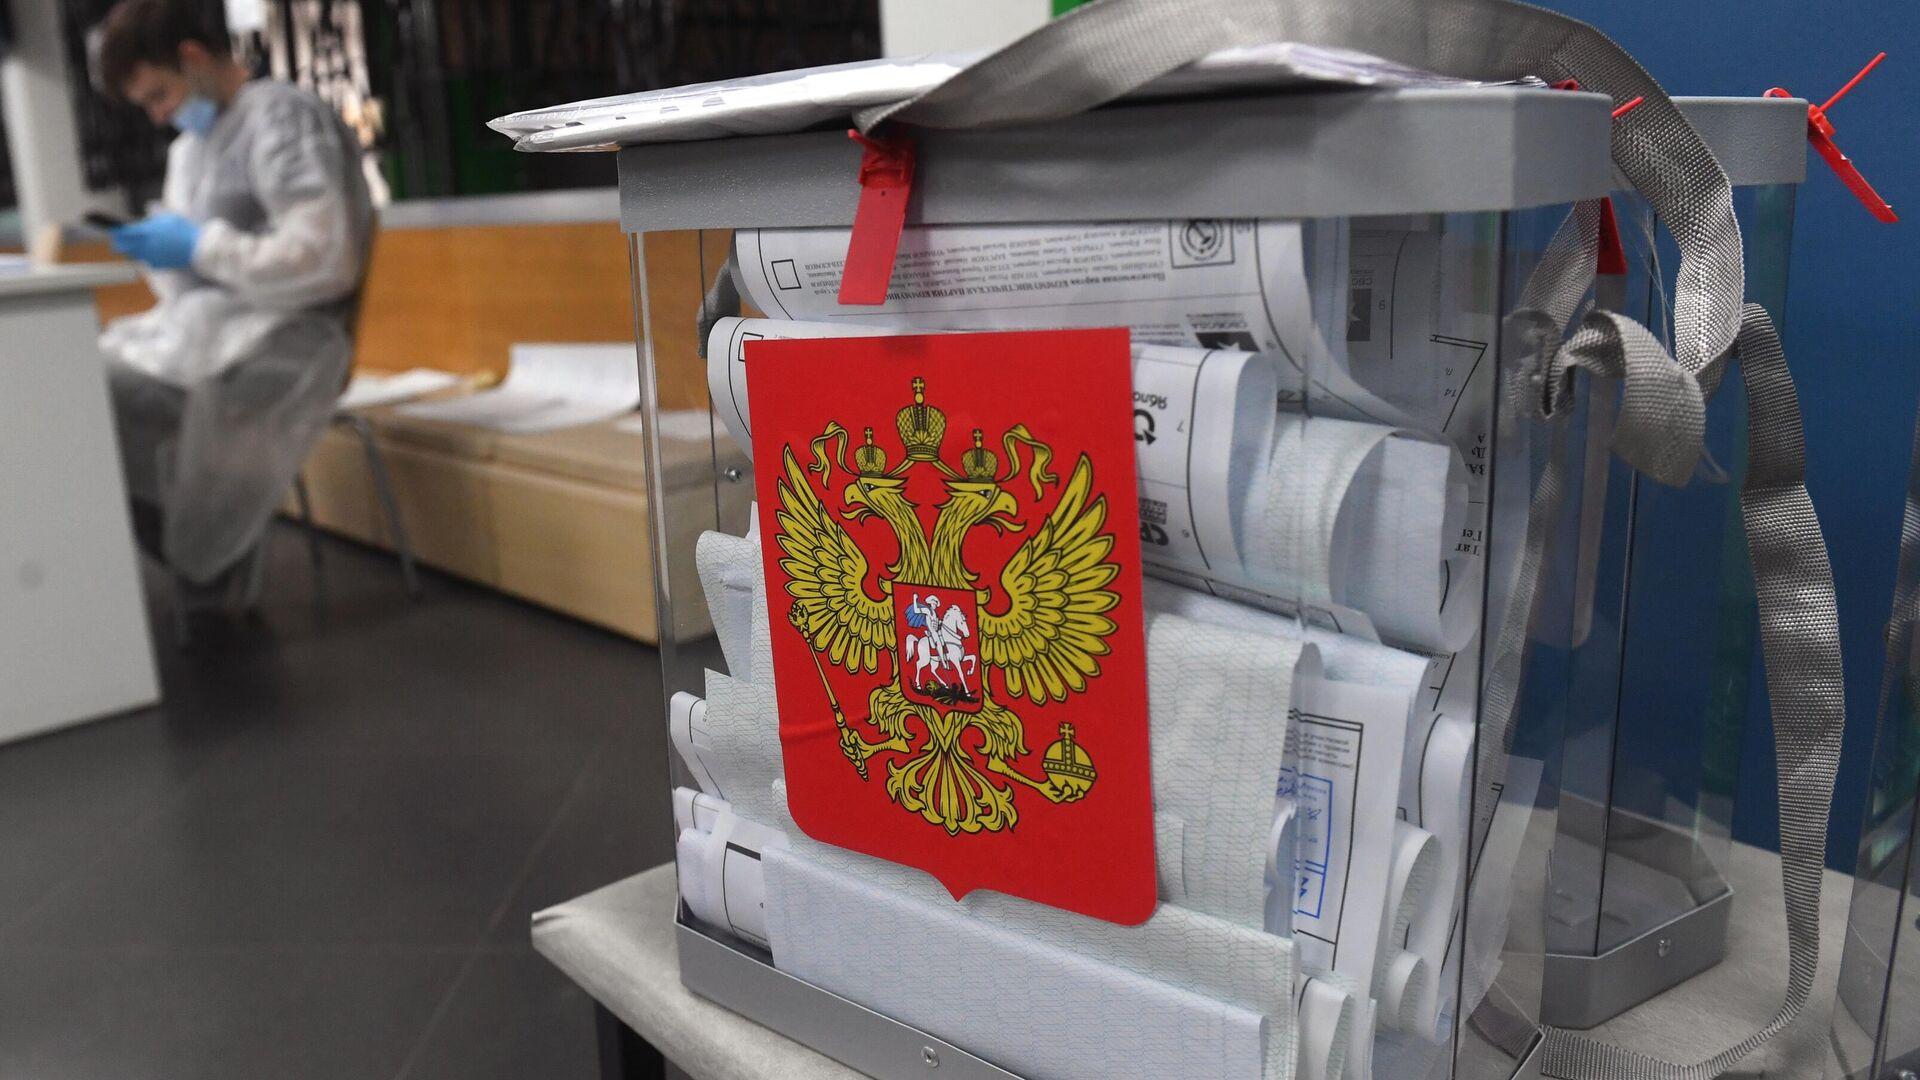 Las elecciones a la Duma de Estado de Rusia - Sputnik Mundo, 1920, 18.09.2021